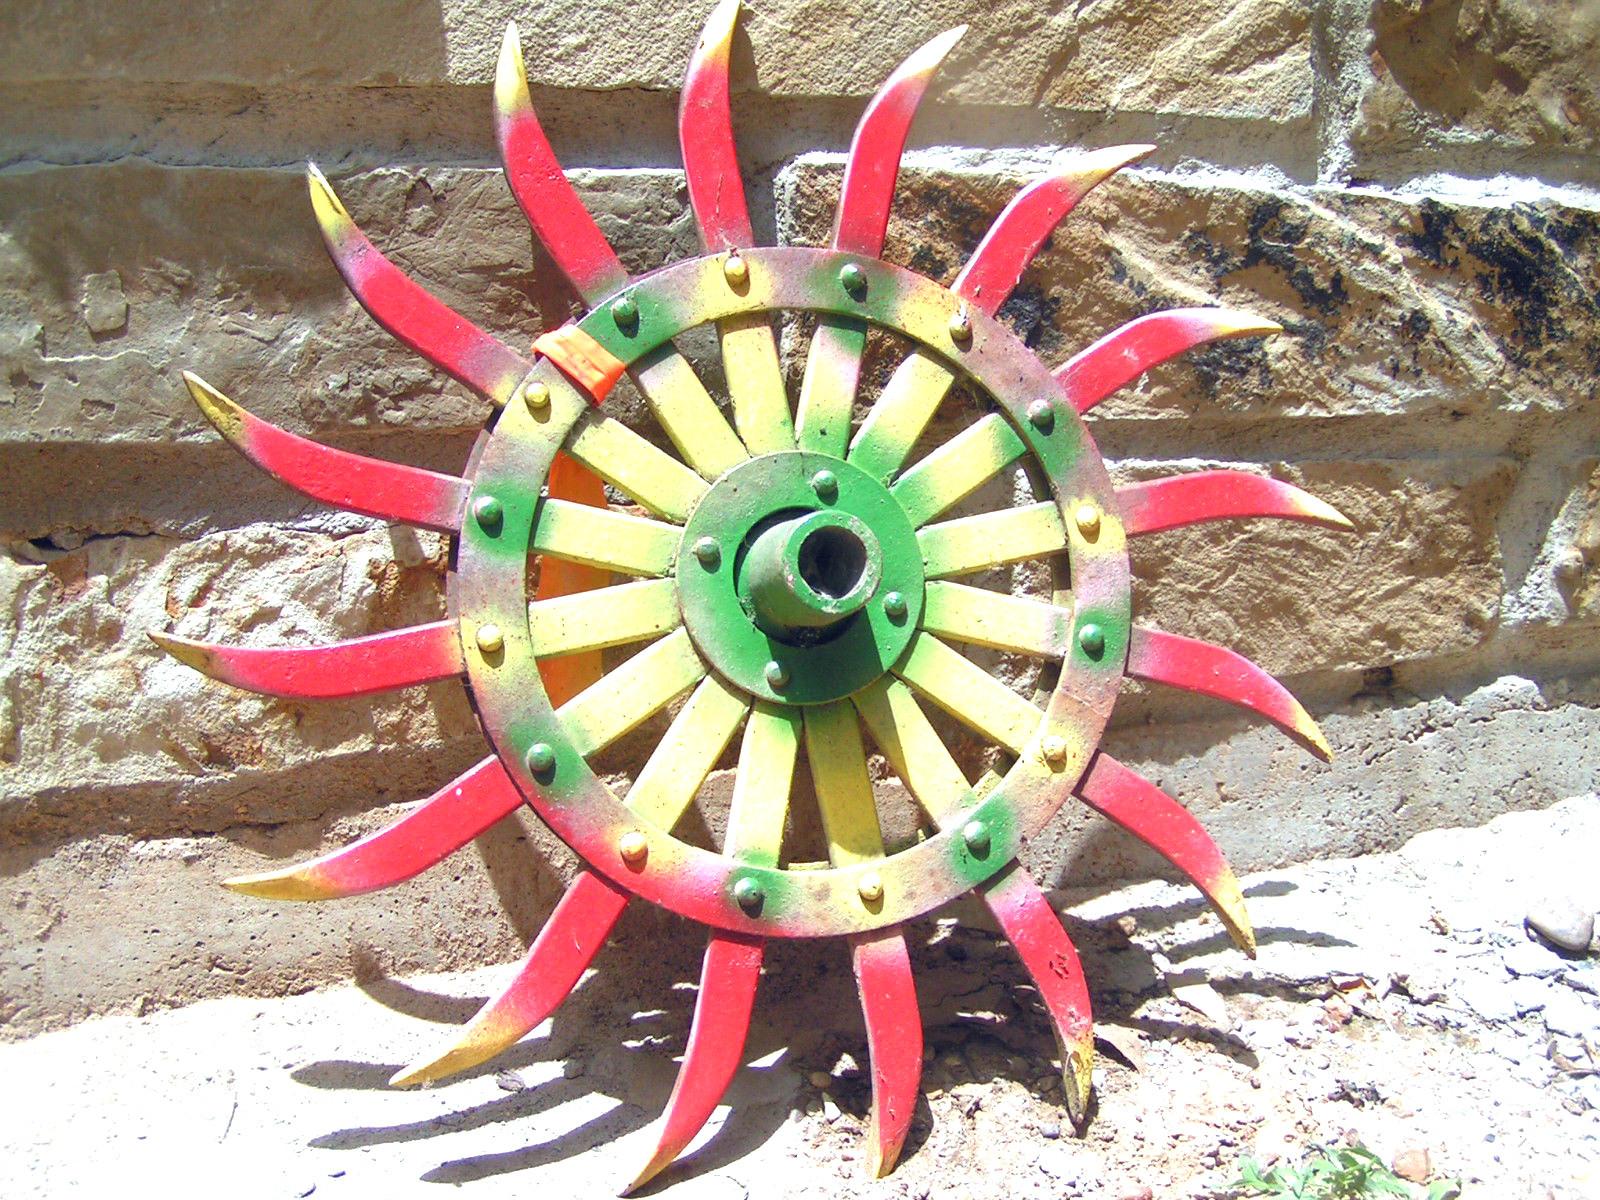 Garden Tiller Wheels : Old iron rotary tiller wheel garden art decor bz